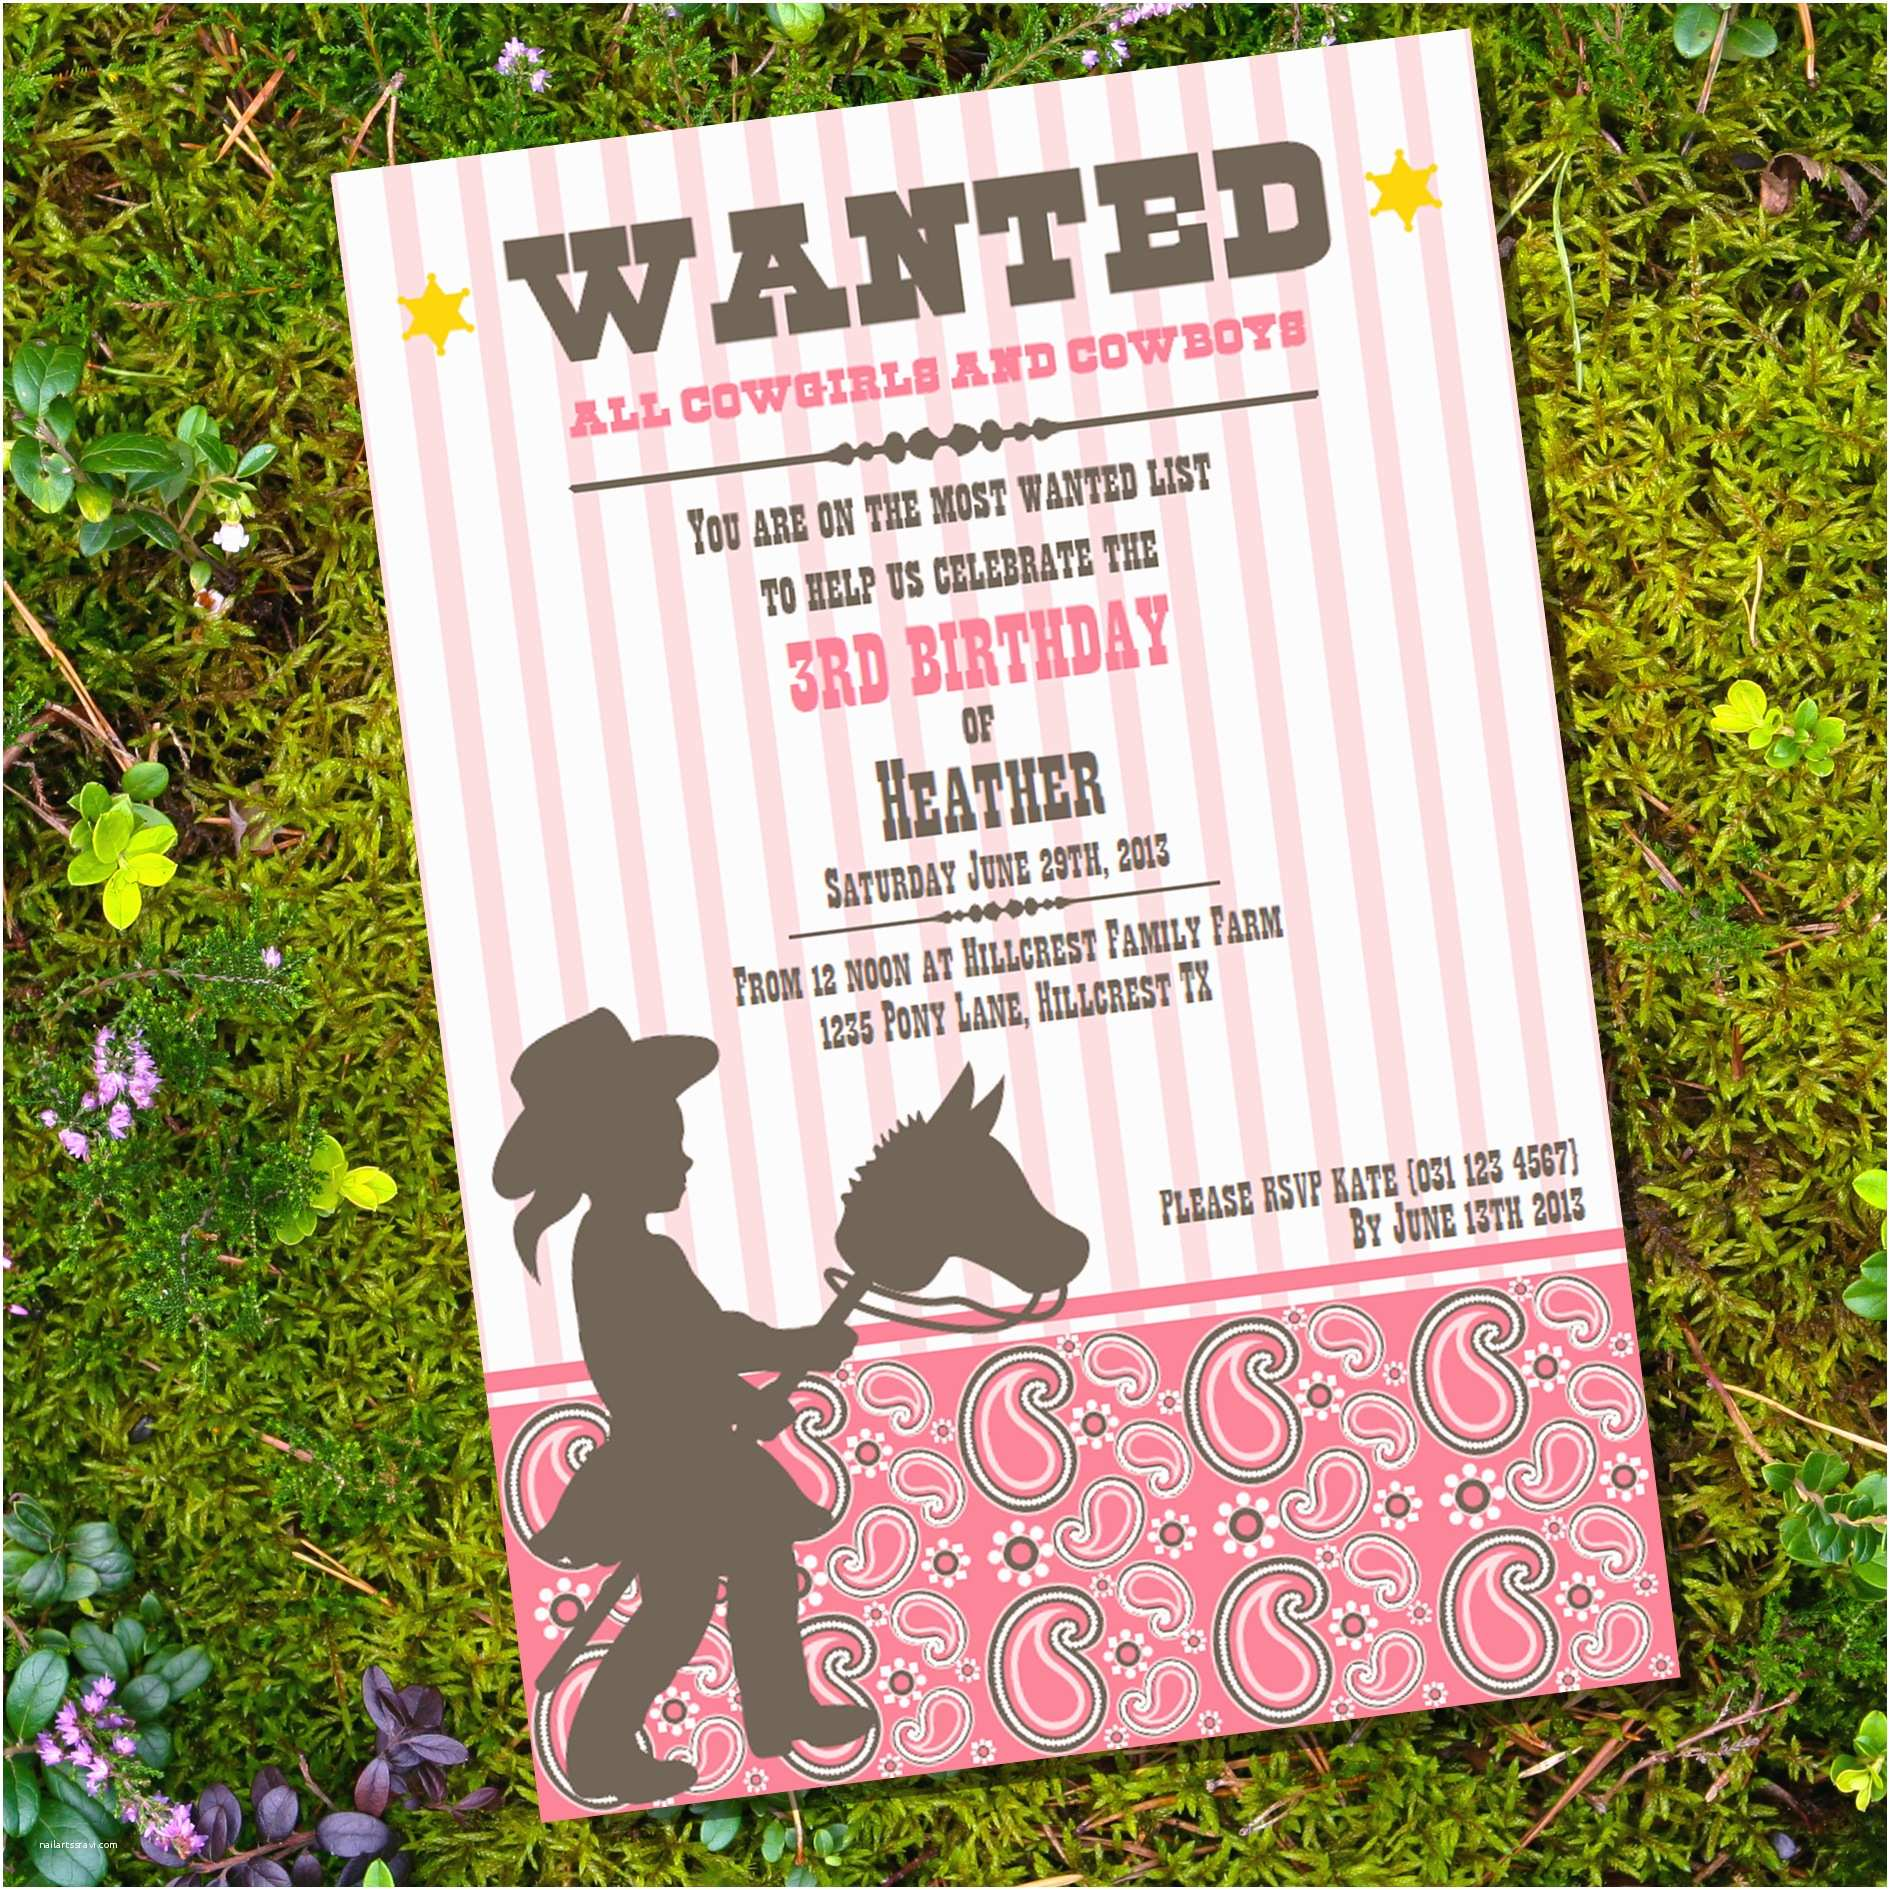 Cowgirl Birthday Invitations Cowgirl Party Invitations – Gangcraft